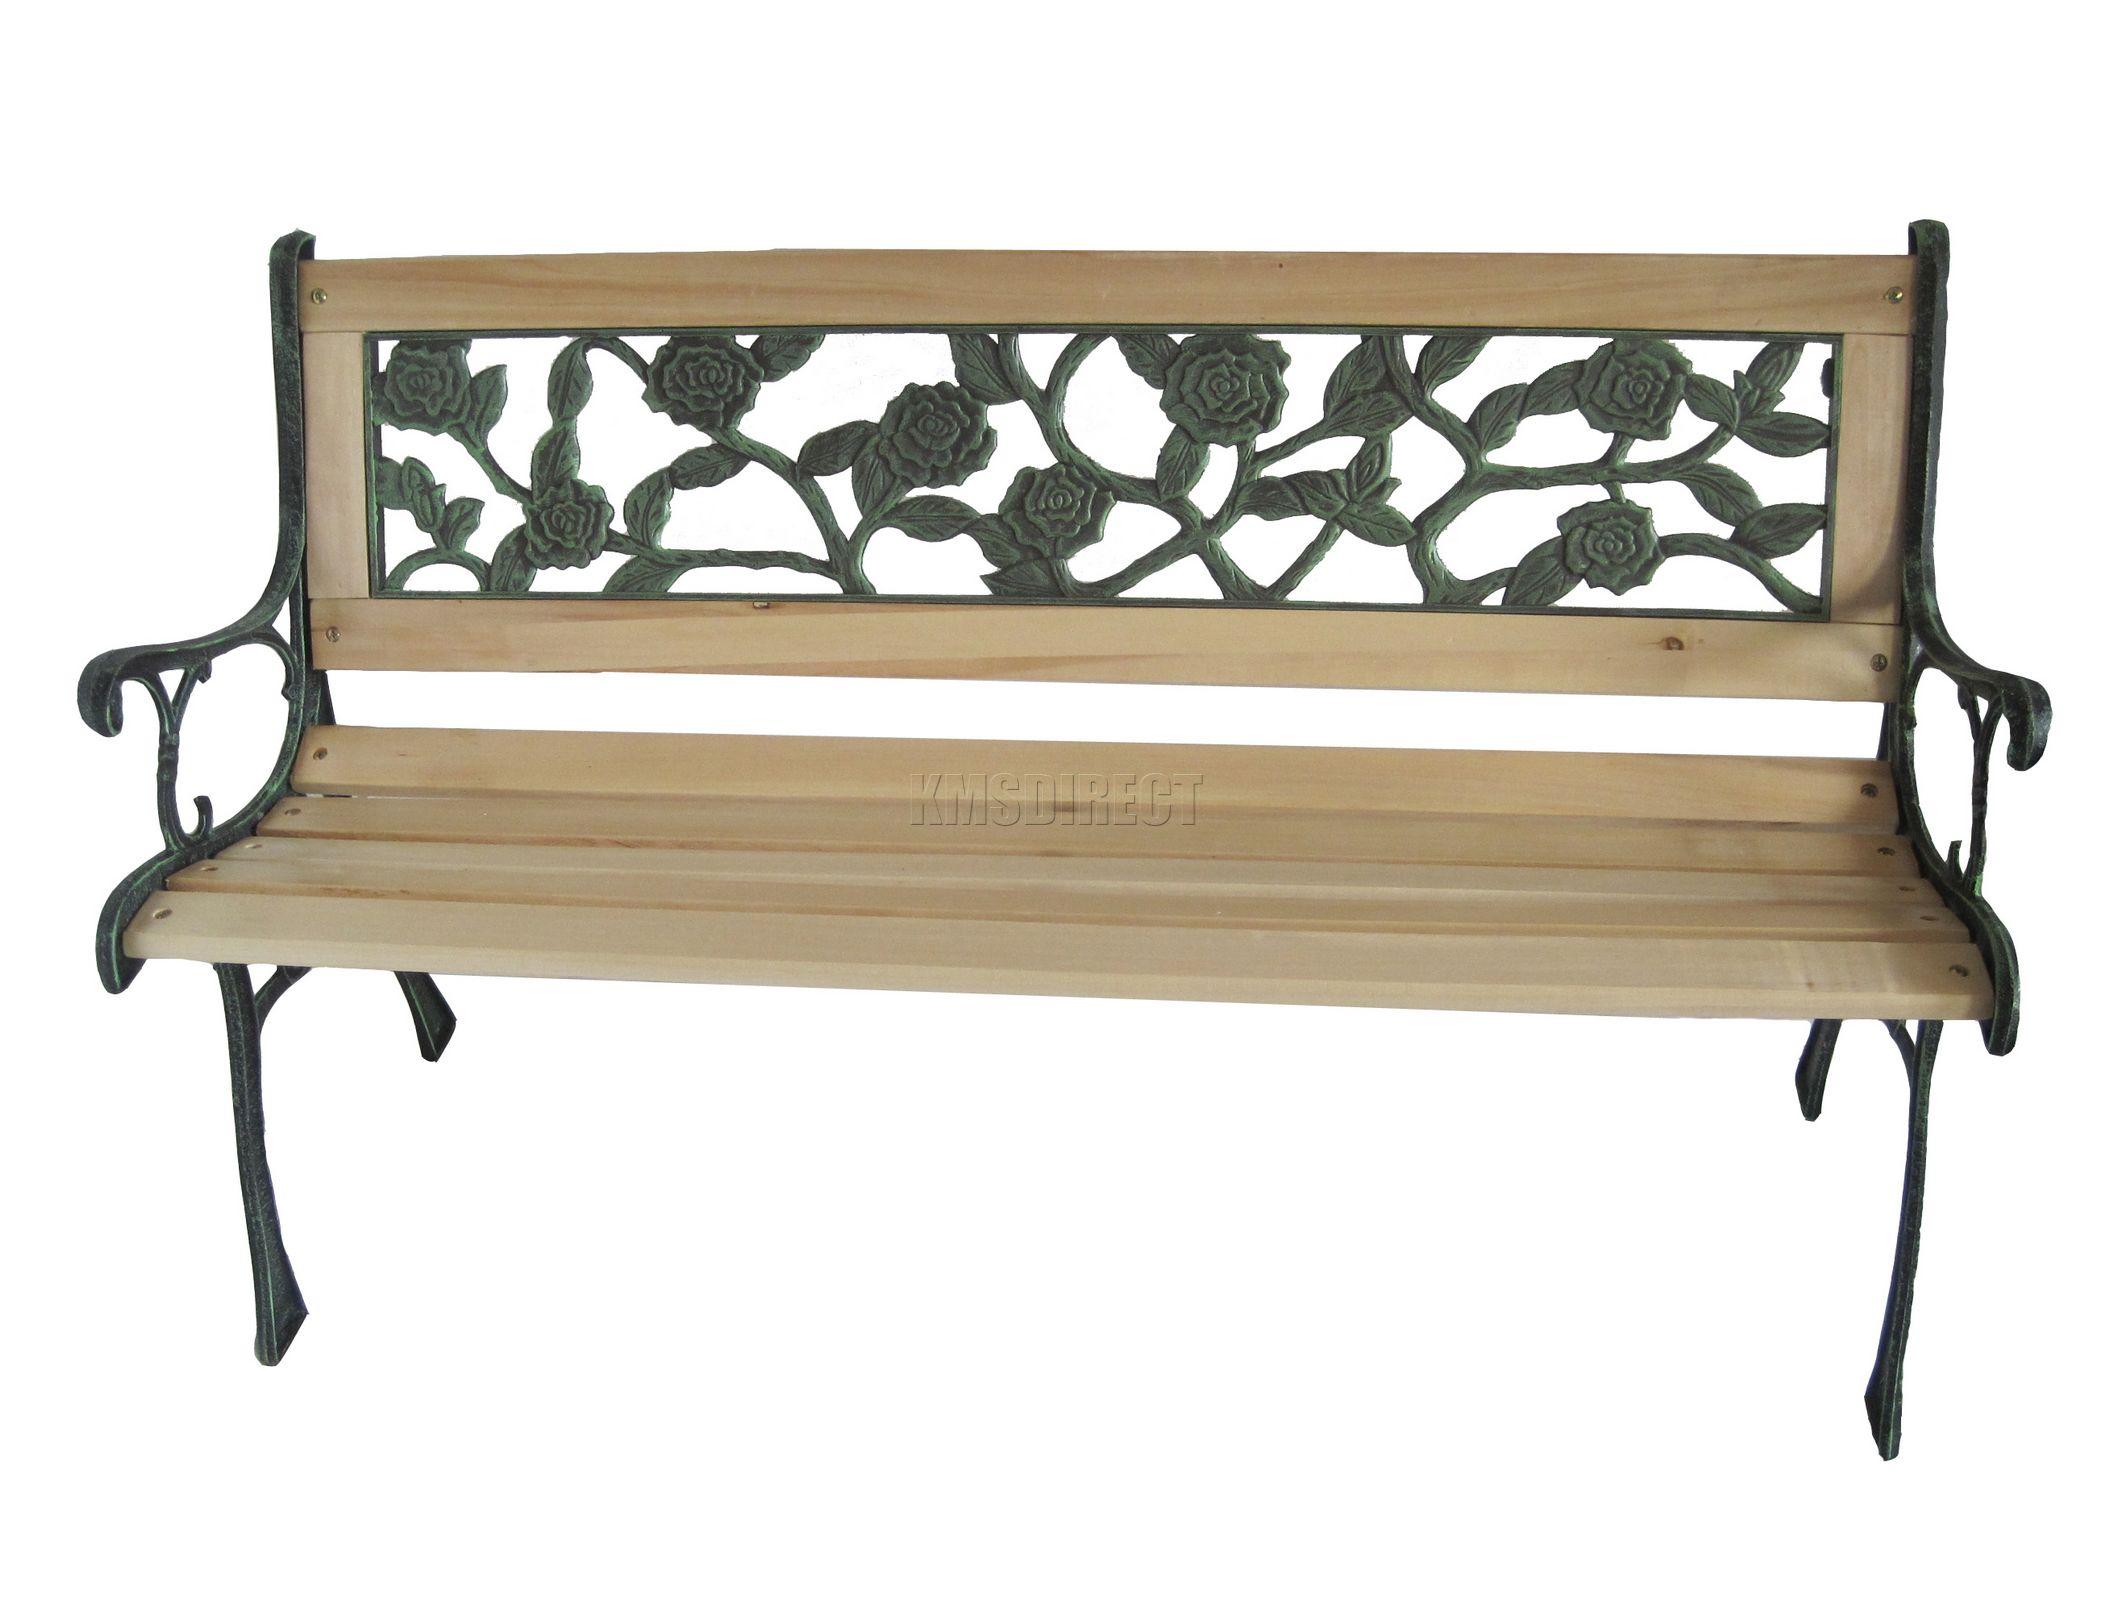 Sentinel WestWood 3 Seater Outdoor Wooden Garden Bench Cast Iron Legs Park  Seat Furniture